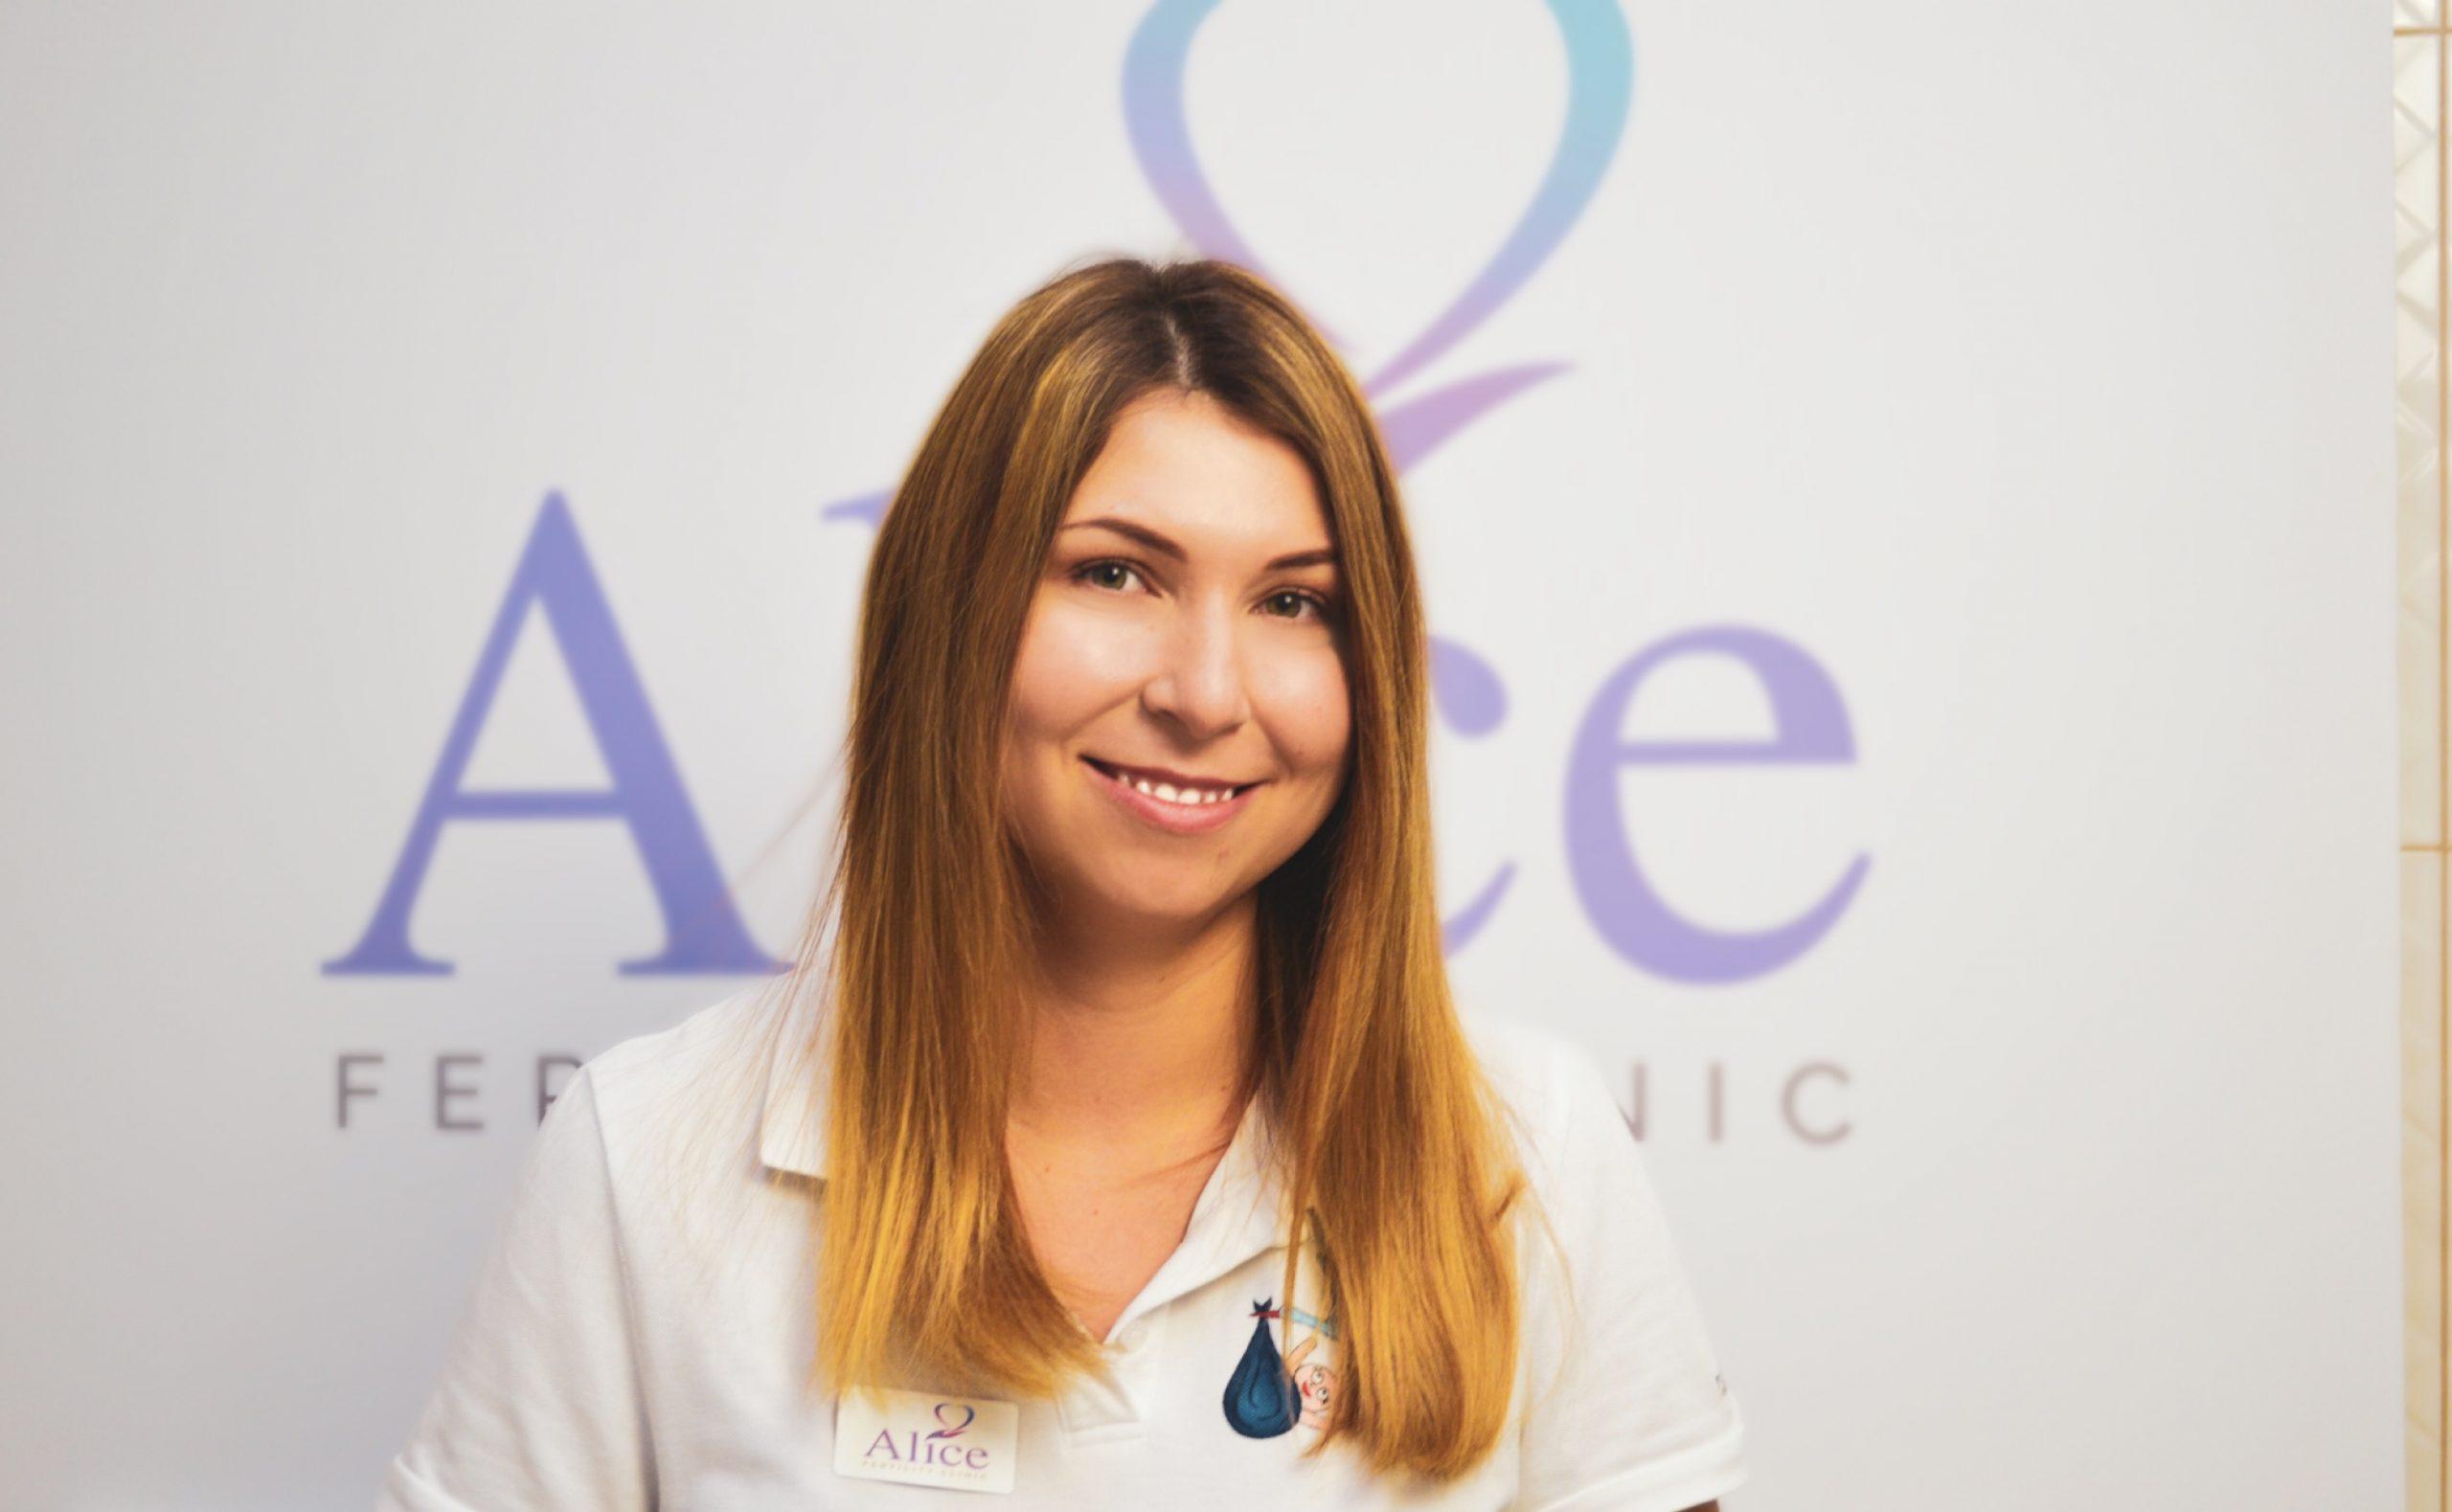 Dr Olena Dubova